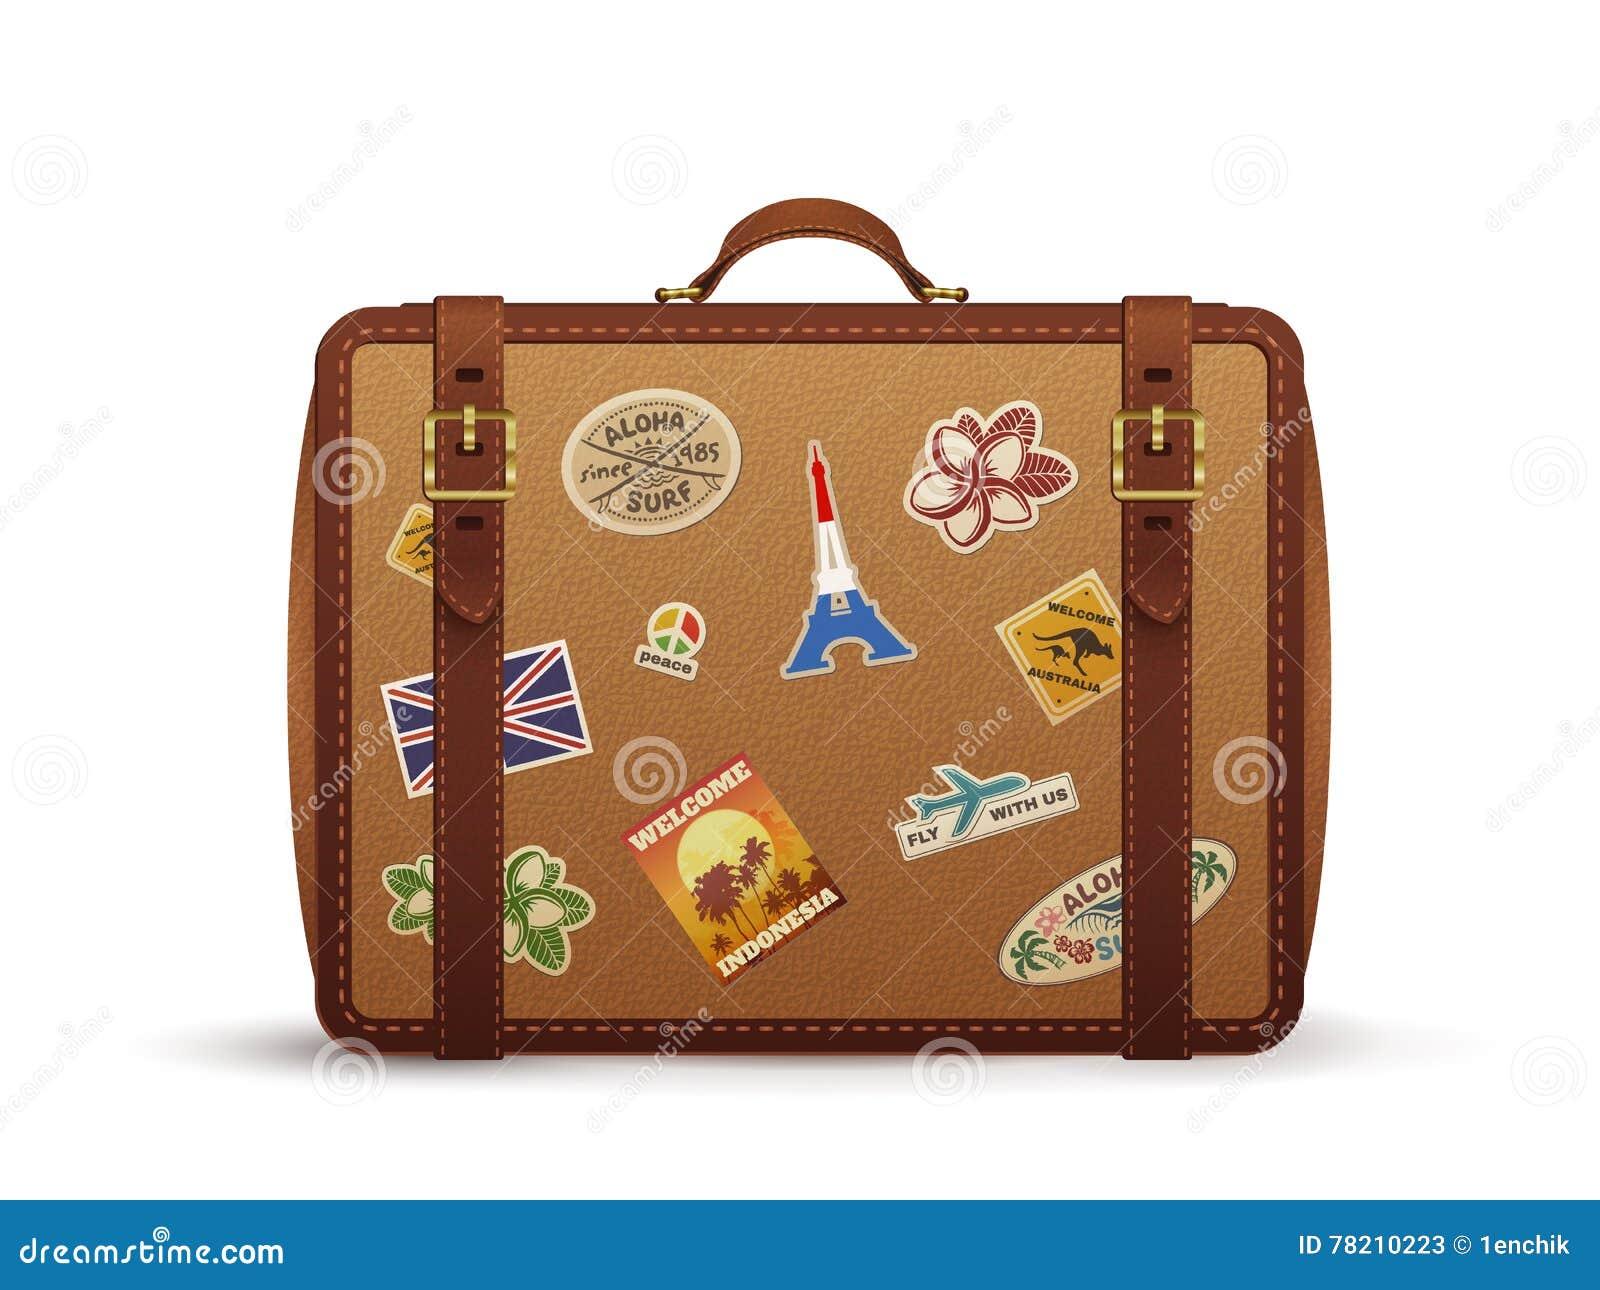 Leather Travel Luggage Australia